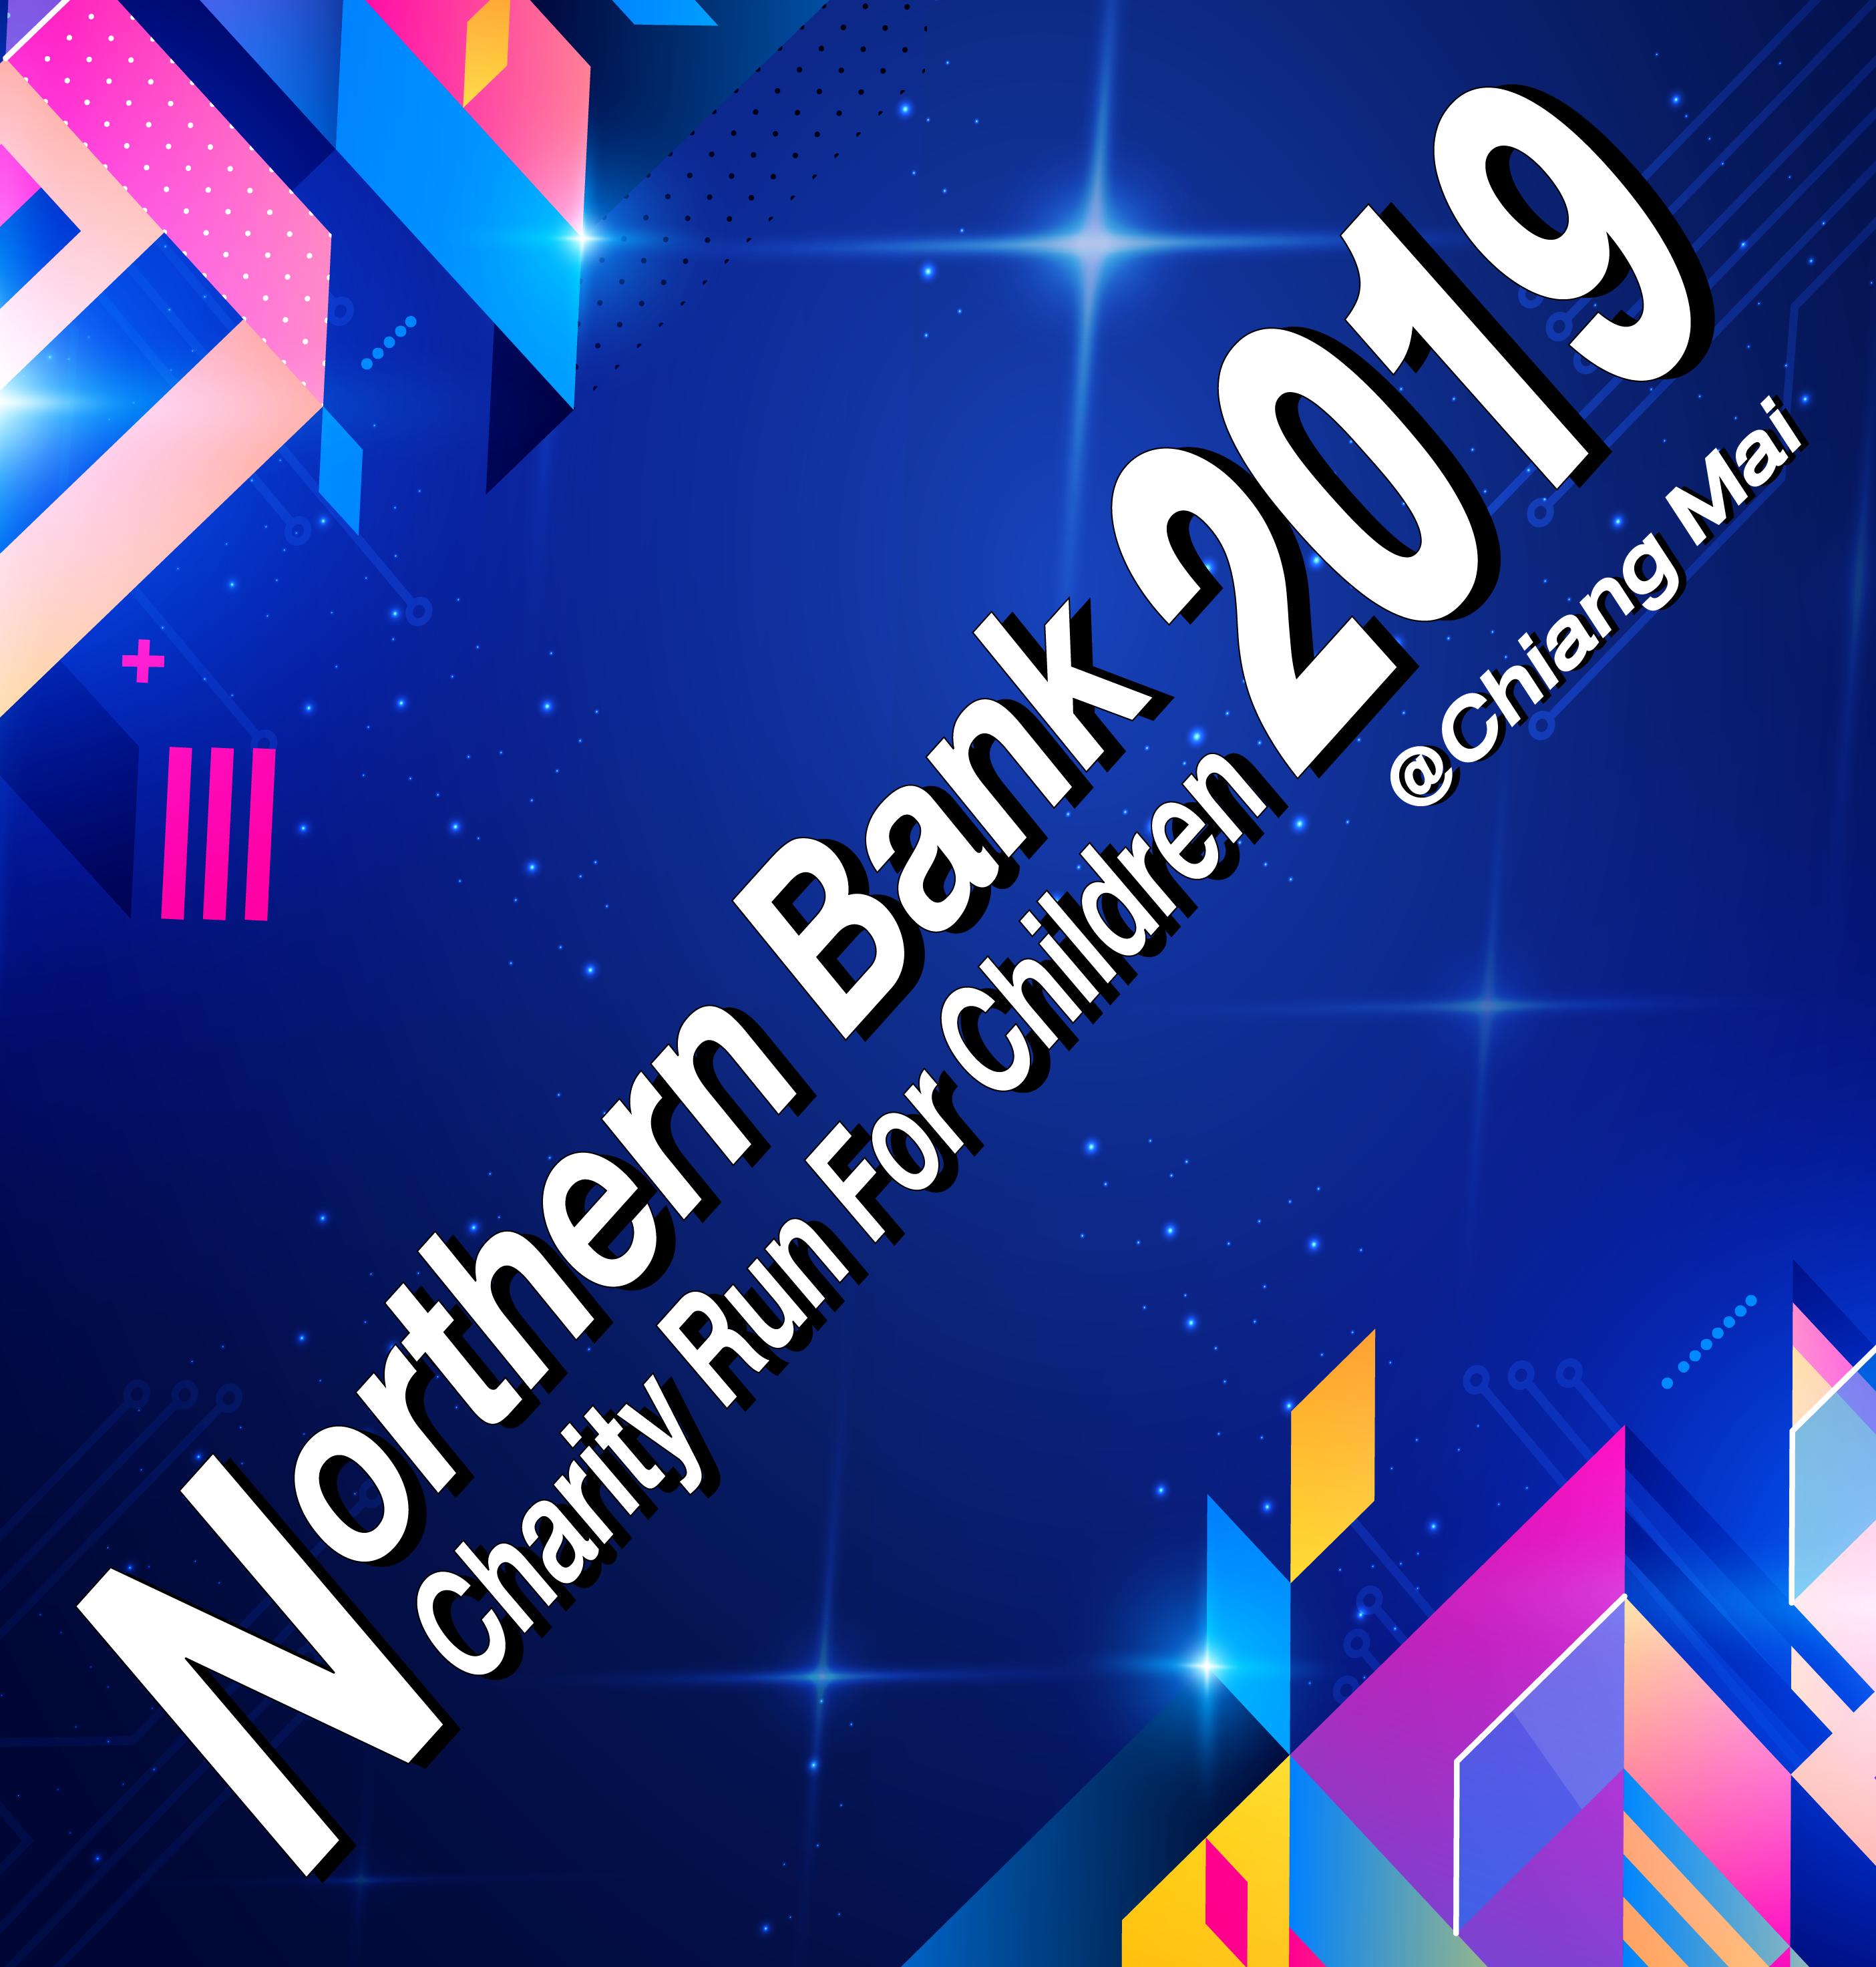 Northern Bank Charity Run  For Children 2019